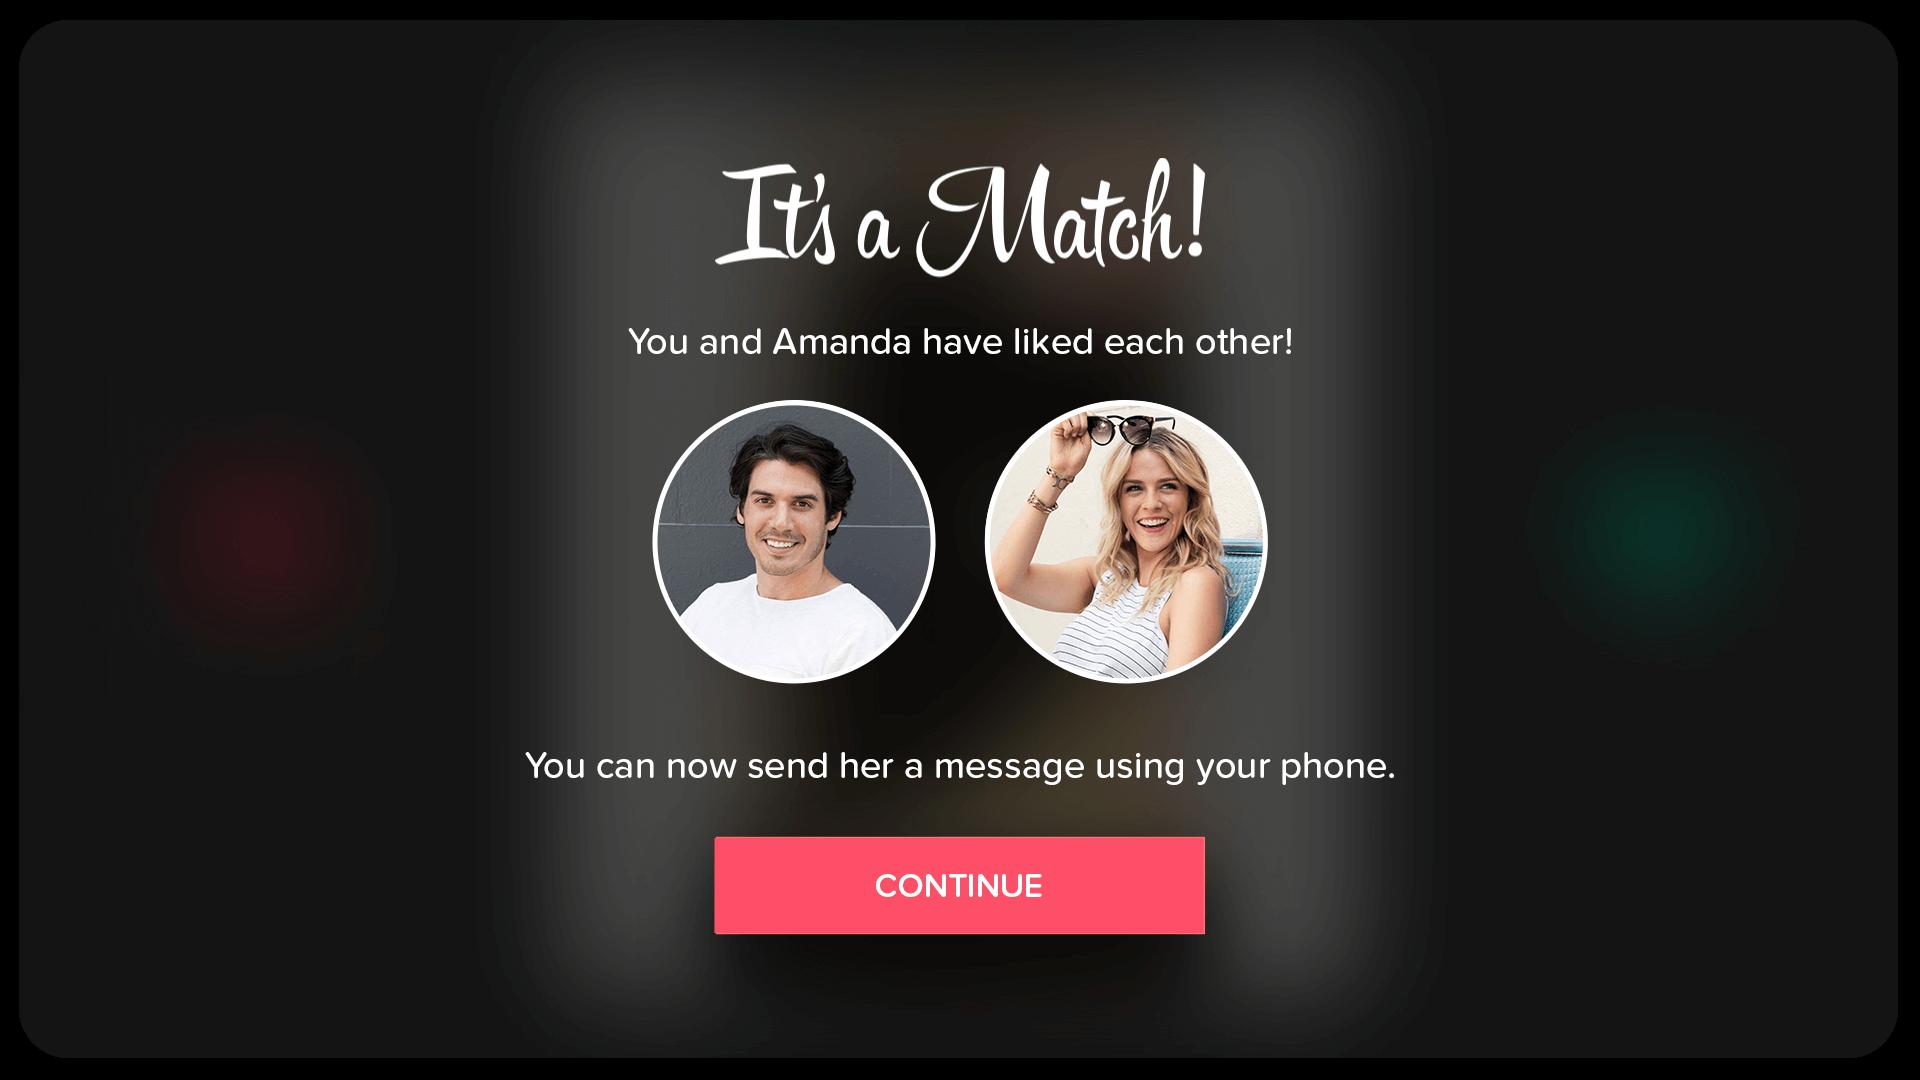 Match com for finding friends